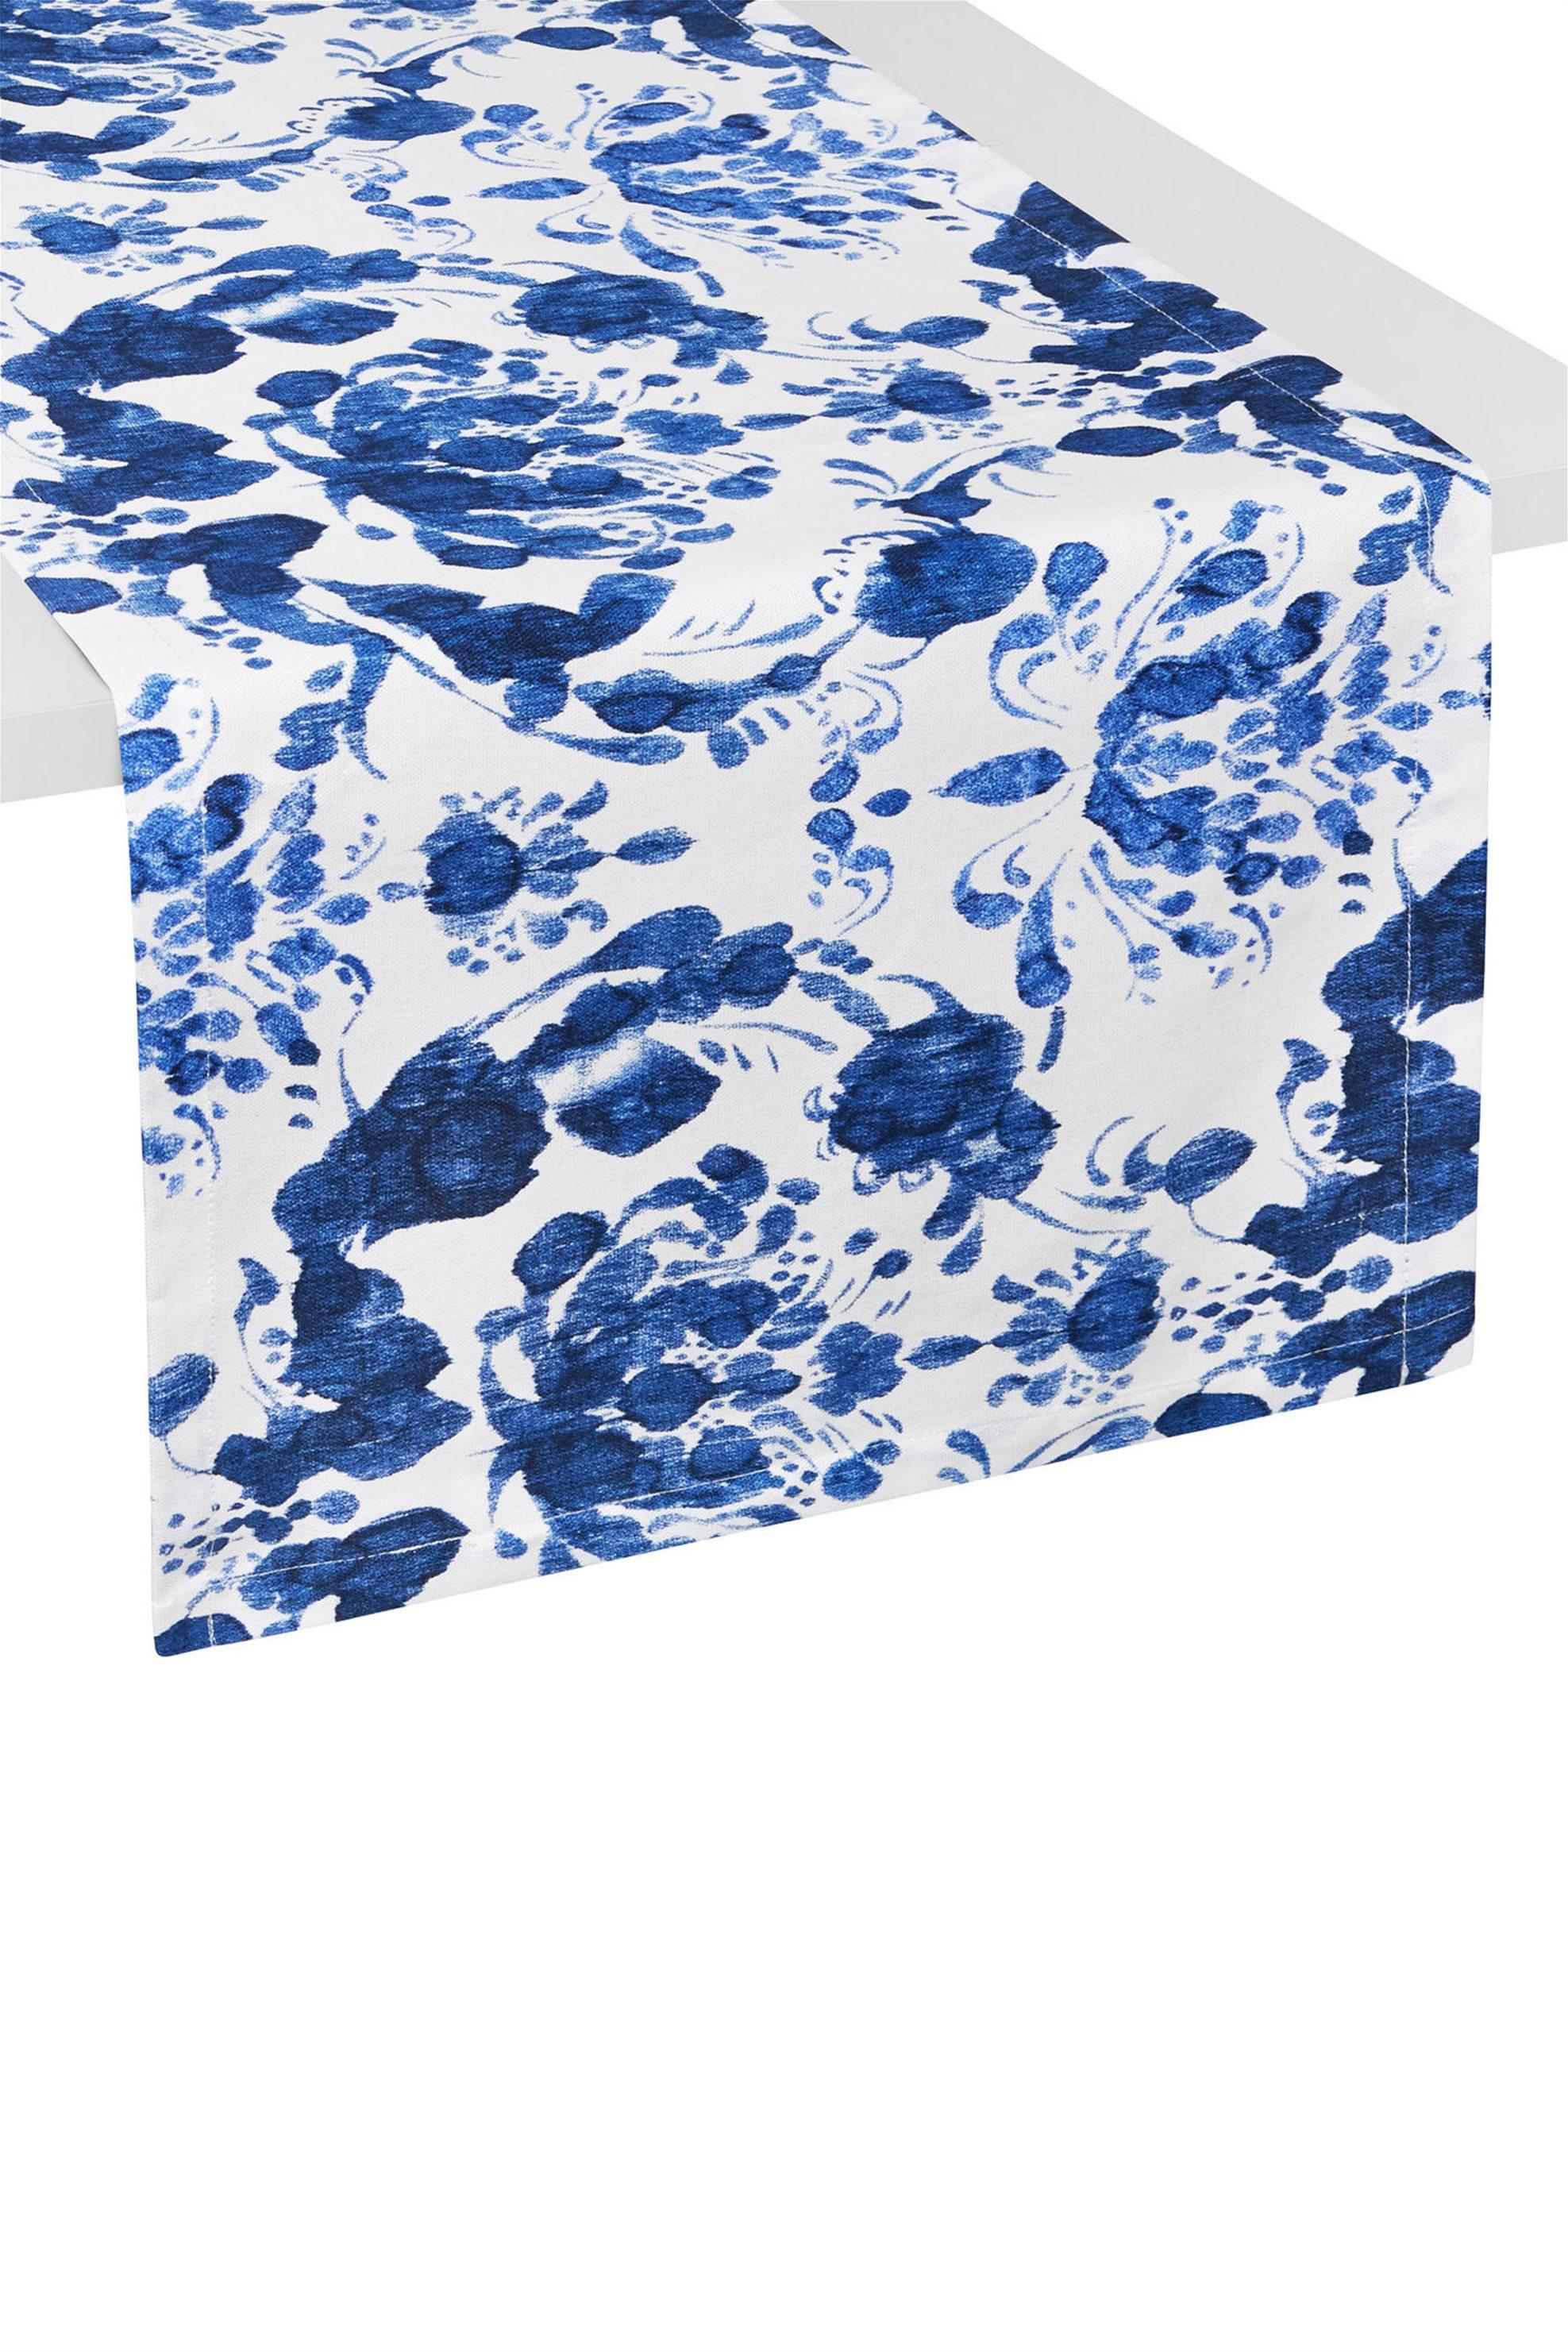 Coincasa ράνερ με σχέδιο Victory 40 x 140 cm - 000494804 - Μπλε home   κουζινα   τραβέρσες   ράνερ